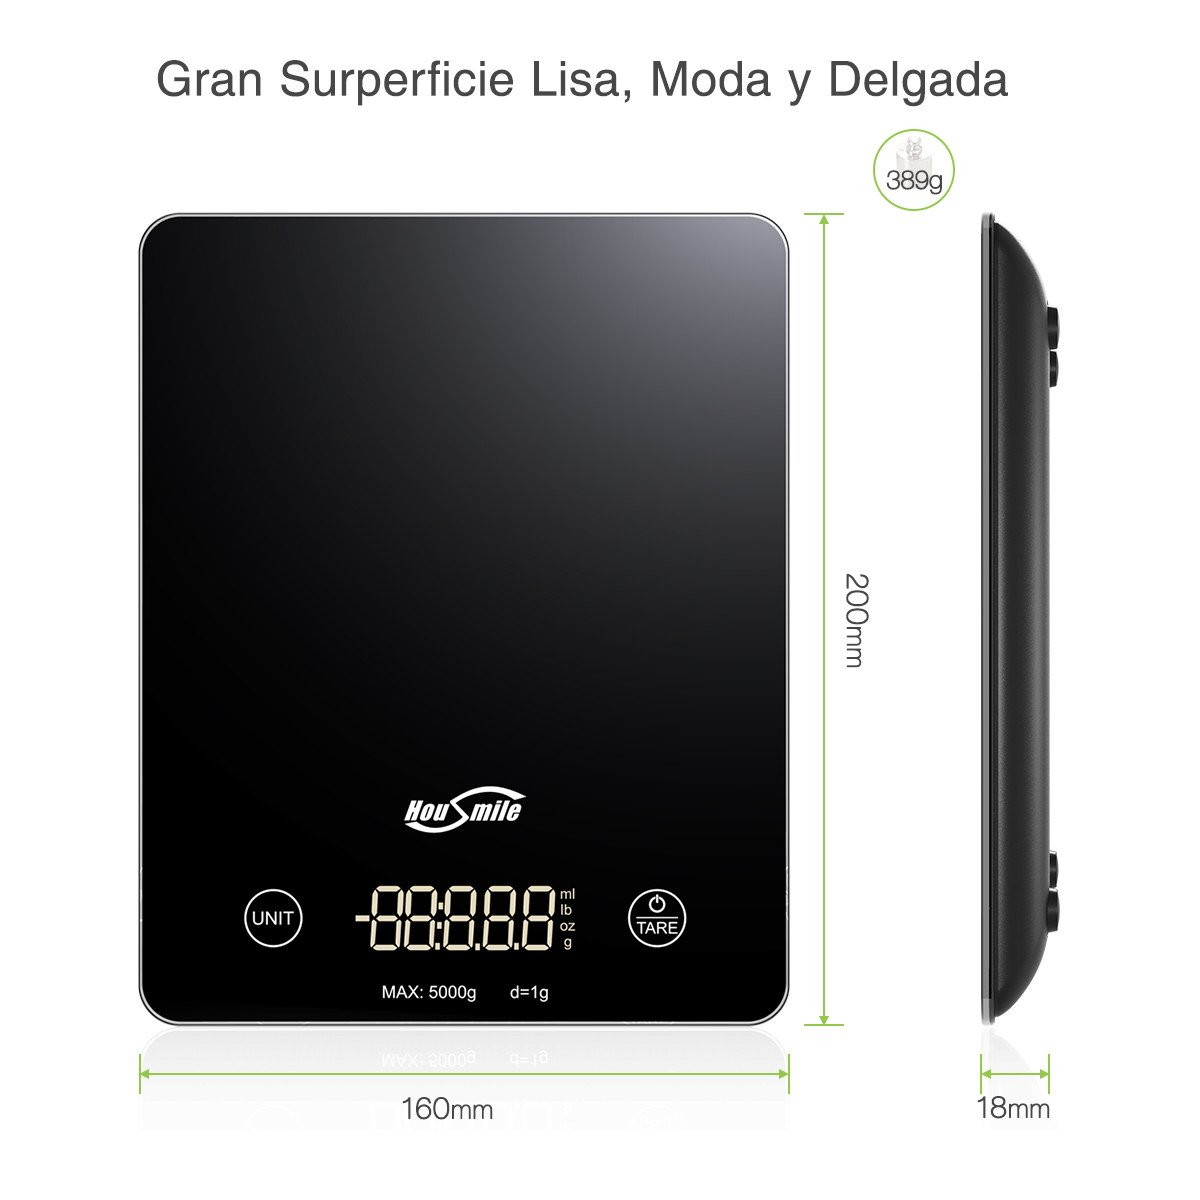 Housmile Báscula Digital de Cocina, Báscula Electrónica Táctil para Cocinar, Balanza de Alimentos Multifuncional, 5kg / 11 lbs, Incluyendo Pilas con Gran ...